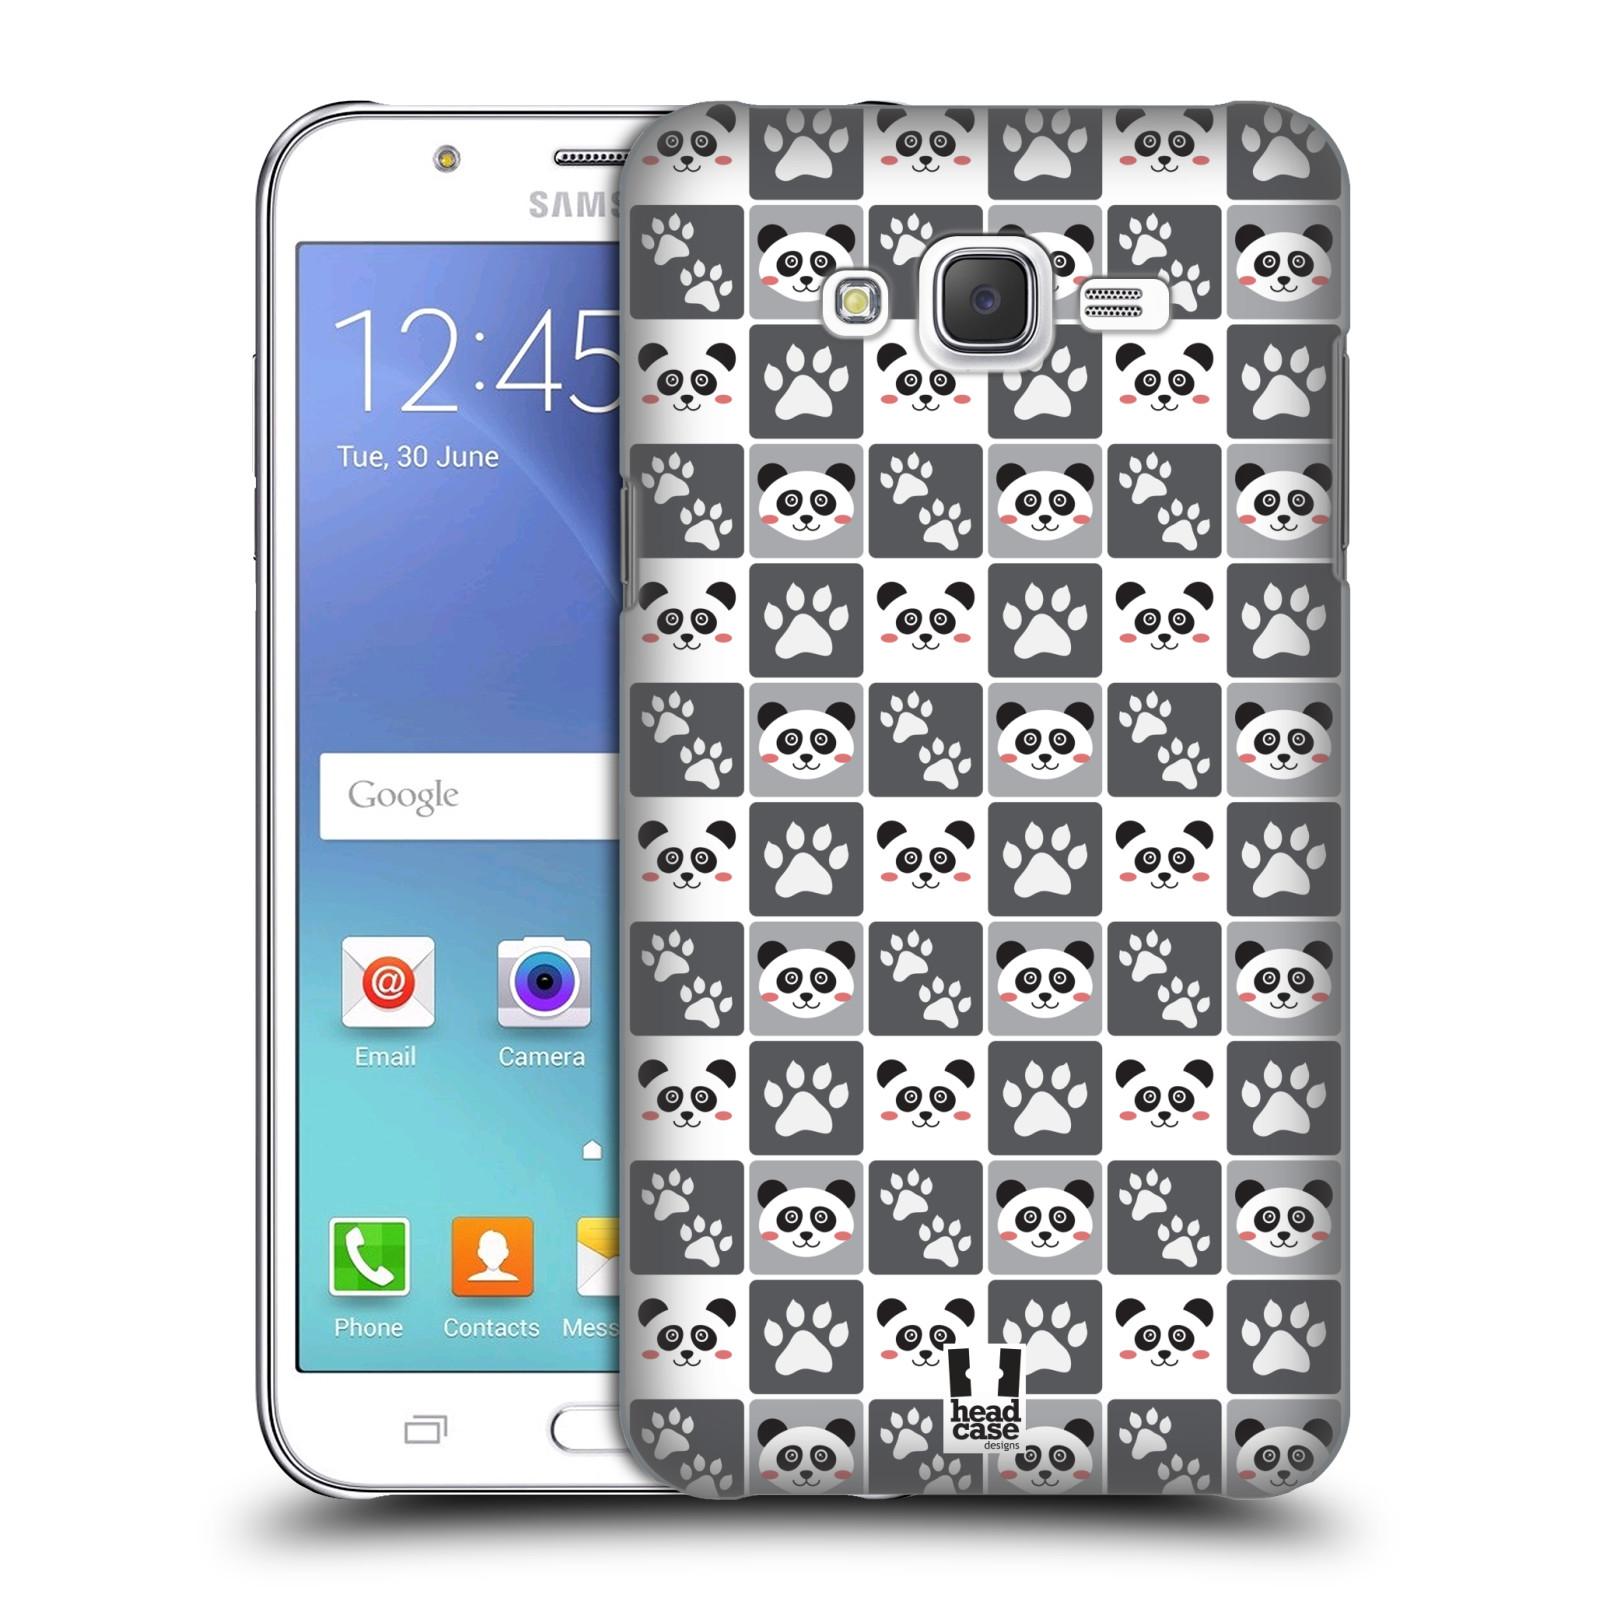 HEAD CASE plastový obal na mobil SAMSUNG Galaxy J7, J700 vzor Zvířecí razítka MEDVÍDEK PANDA